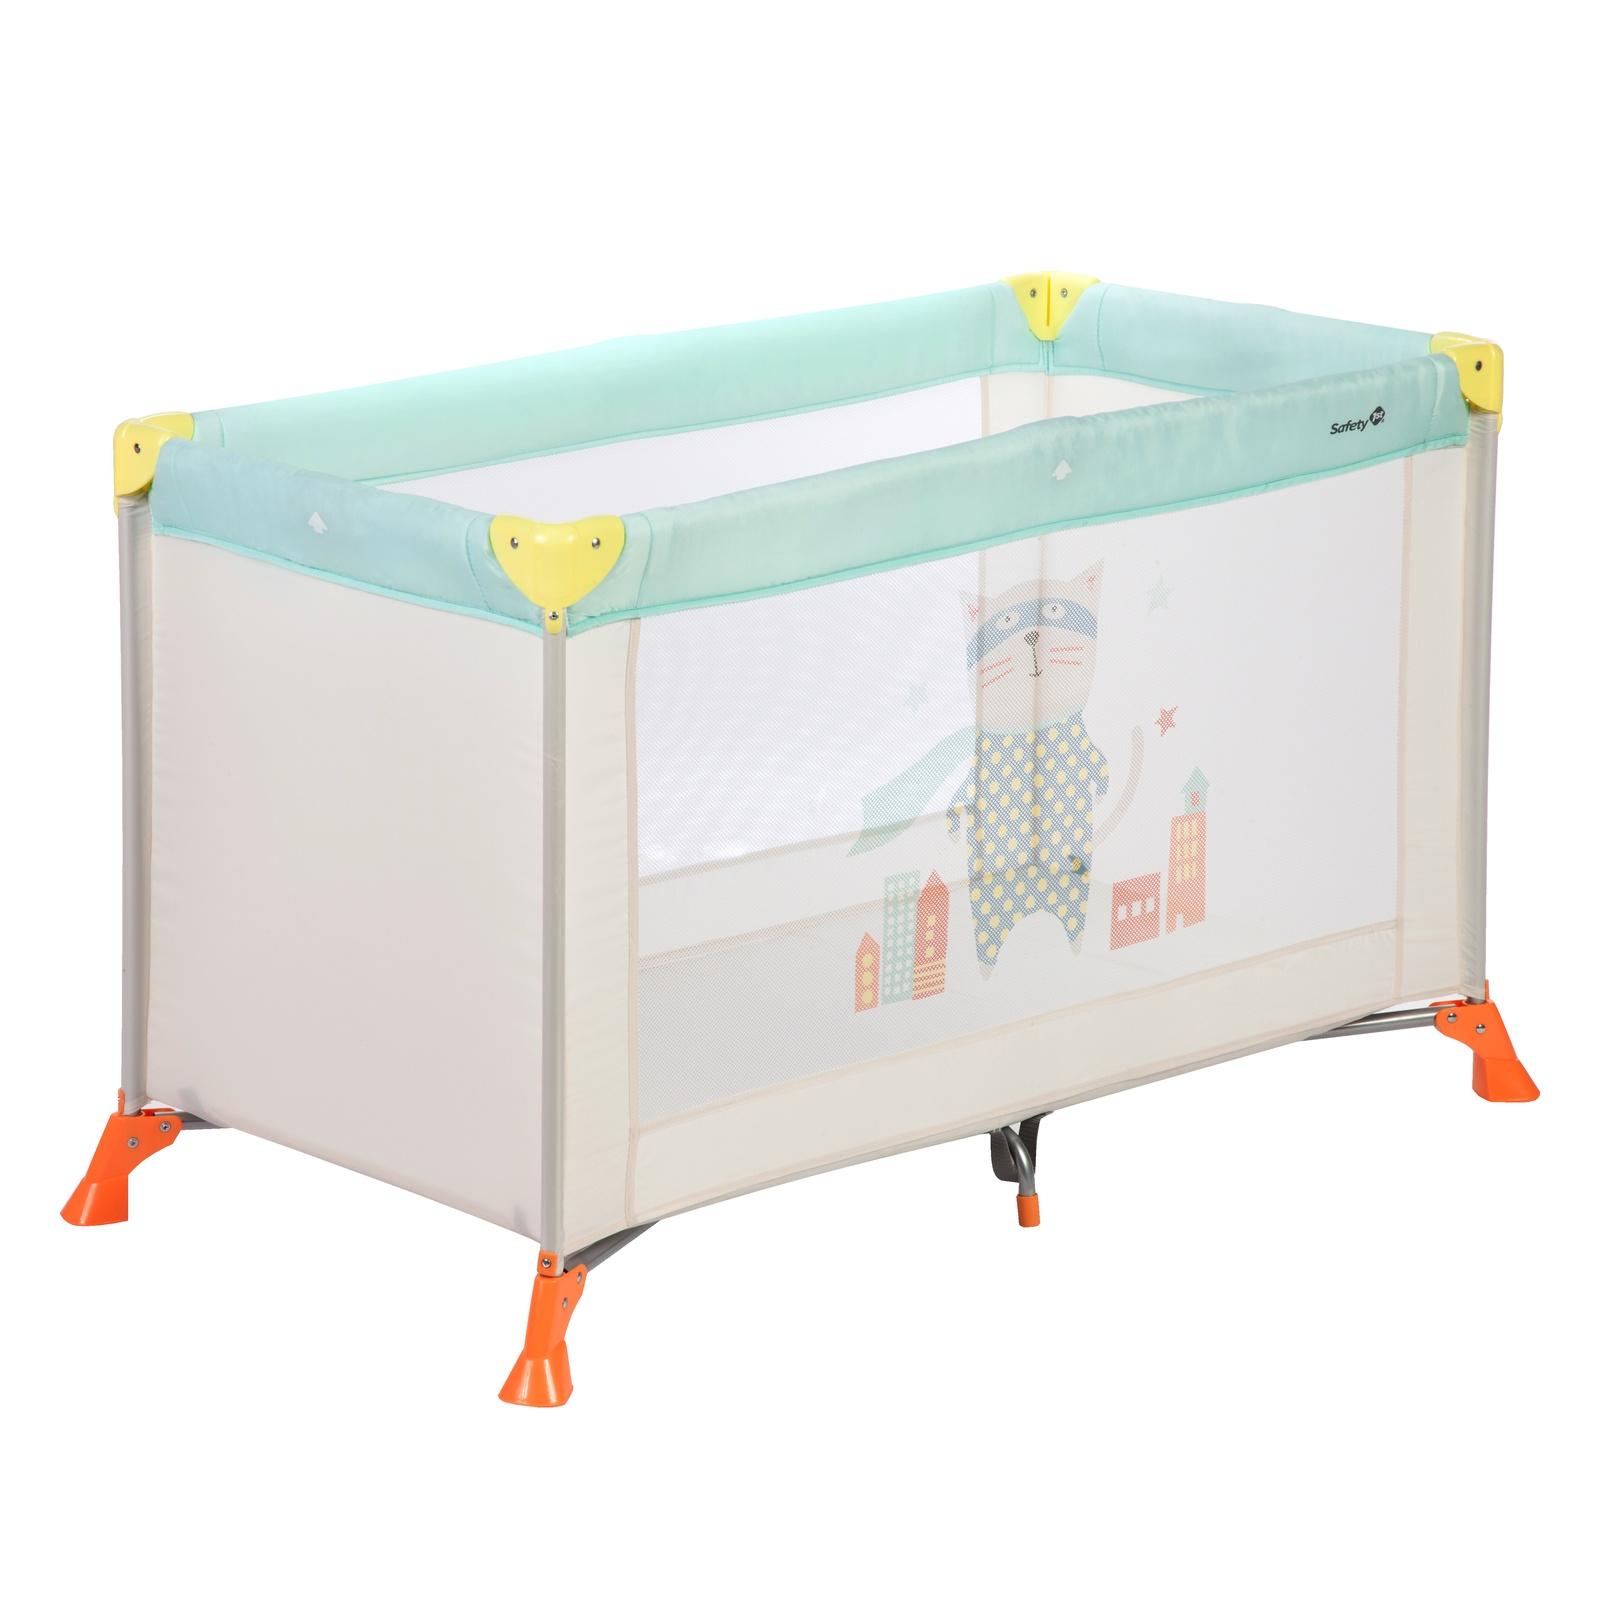 Манеж-кроватка Safety 1st Soft Dreams 2112261000, 2112261000 голубой